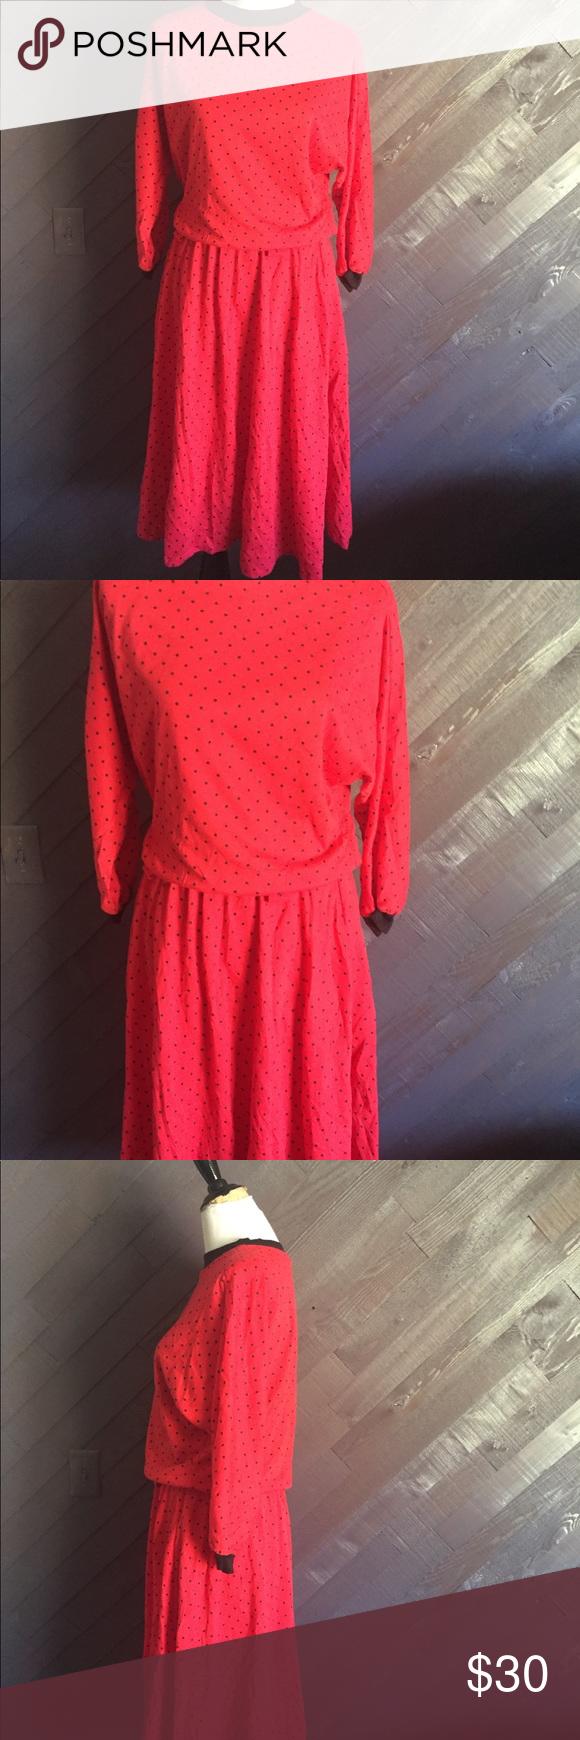 Vintage red polka dot dress red polka dot dress arm pits